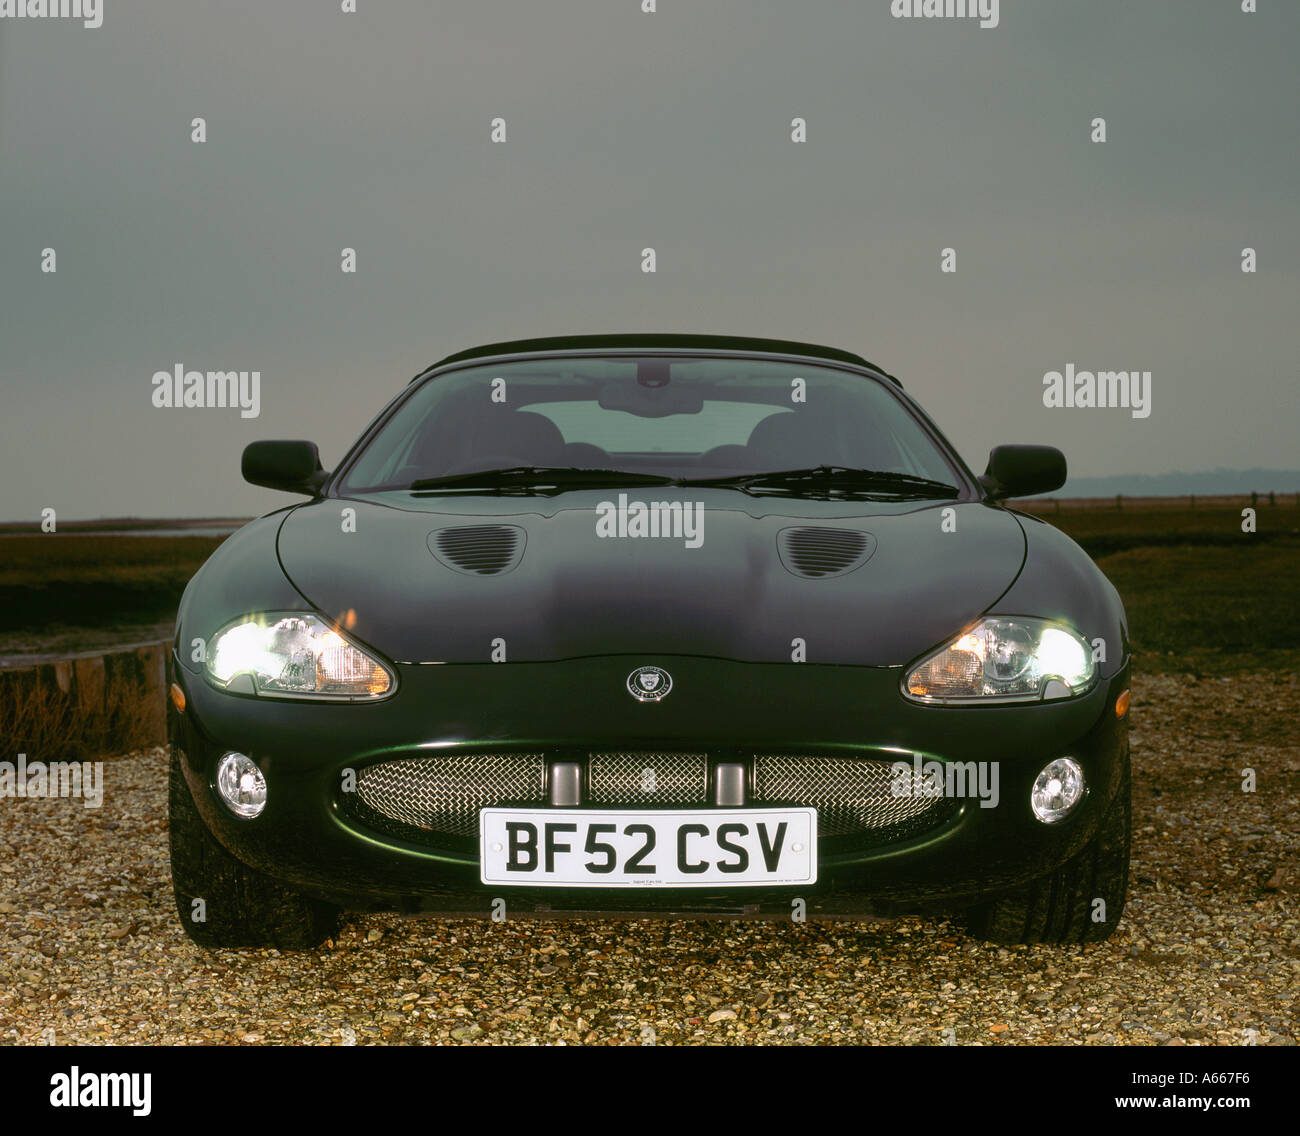 2002 Jaguar XKR convertible - Stock Image